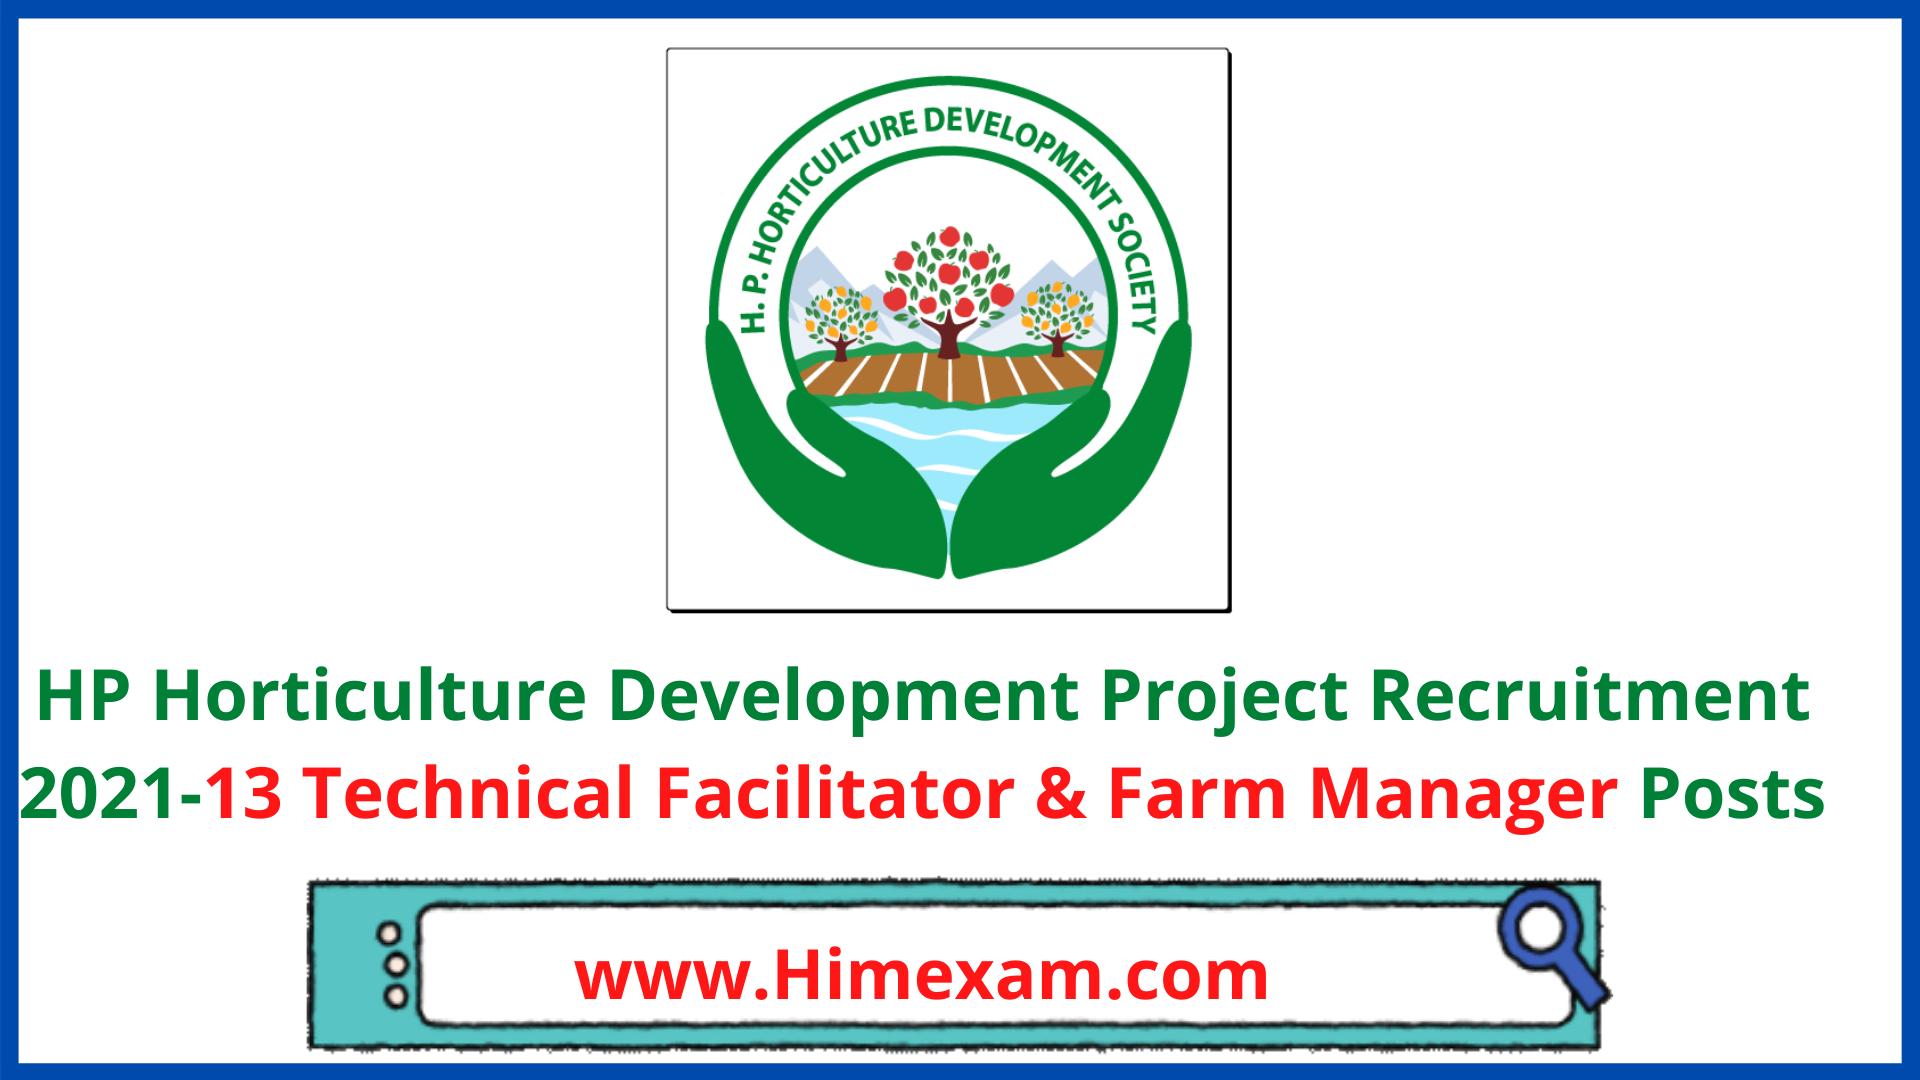 HP Horticulture Development Project Recruitment 2021-13 Technical Facilitator & Farm Manager Posts